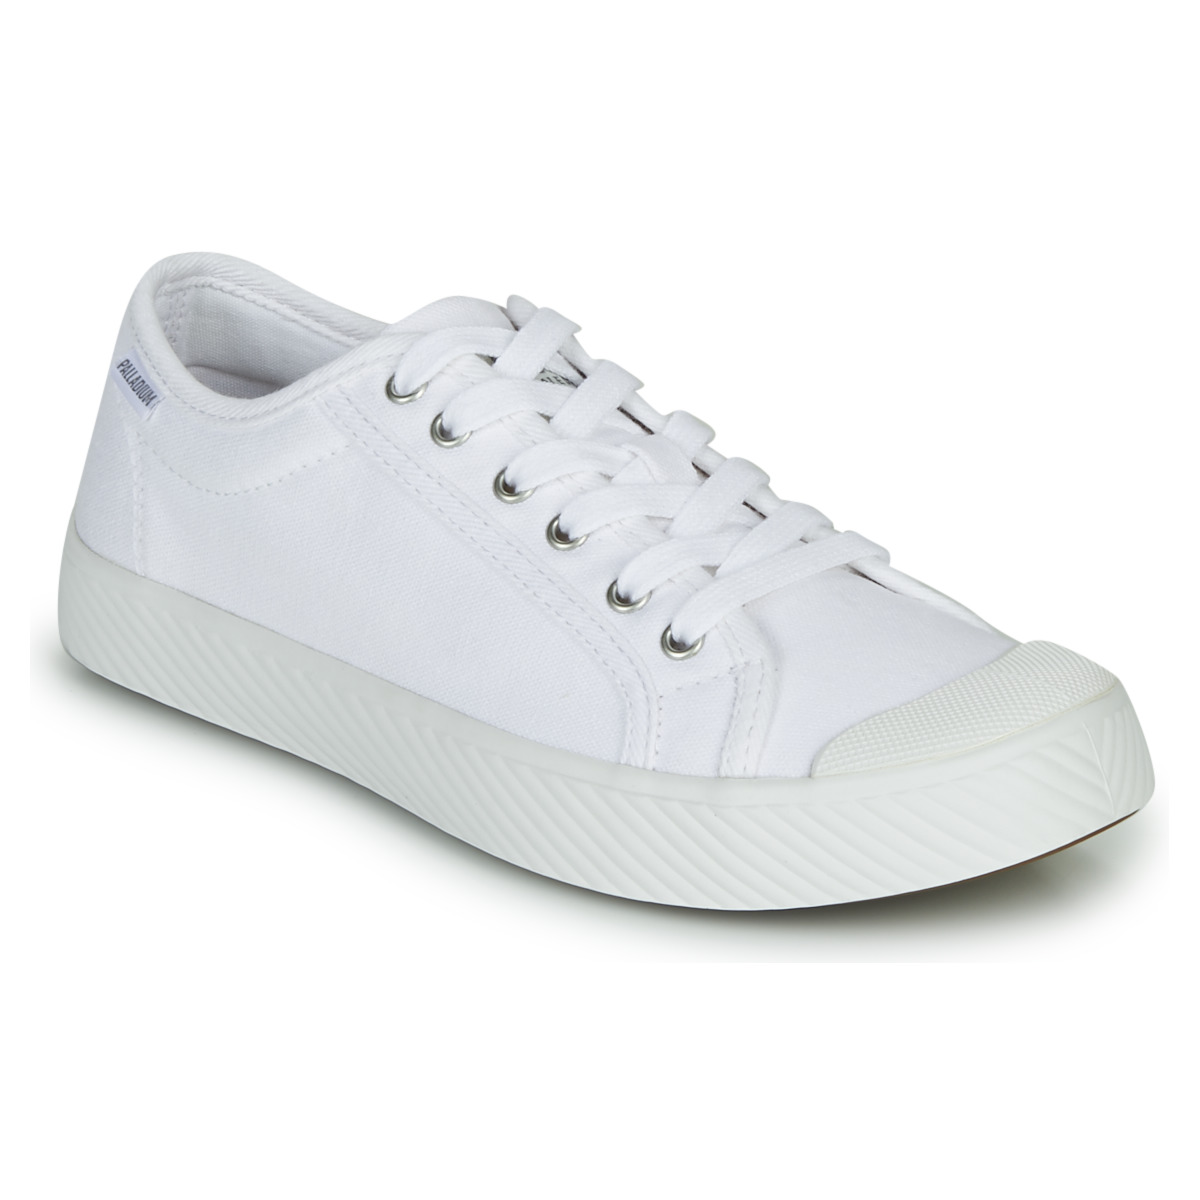 Sneakers uomo Palladium  PALLAPHOENIX O C  Bianco Palladium 3610941356424